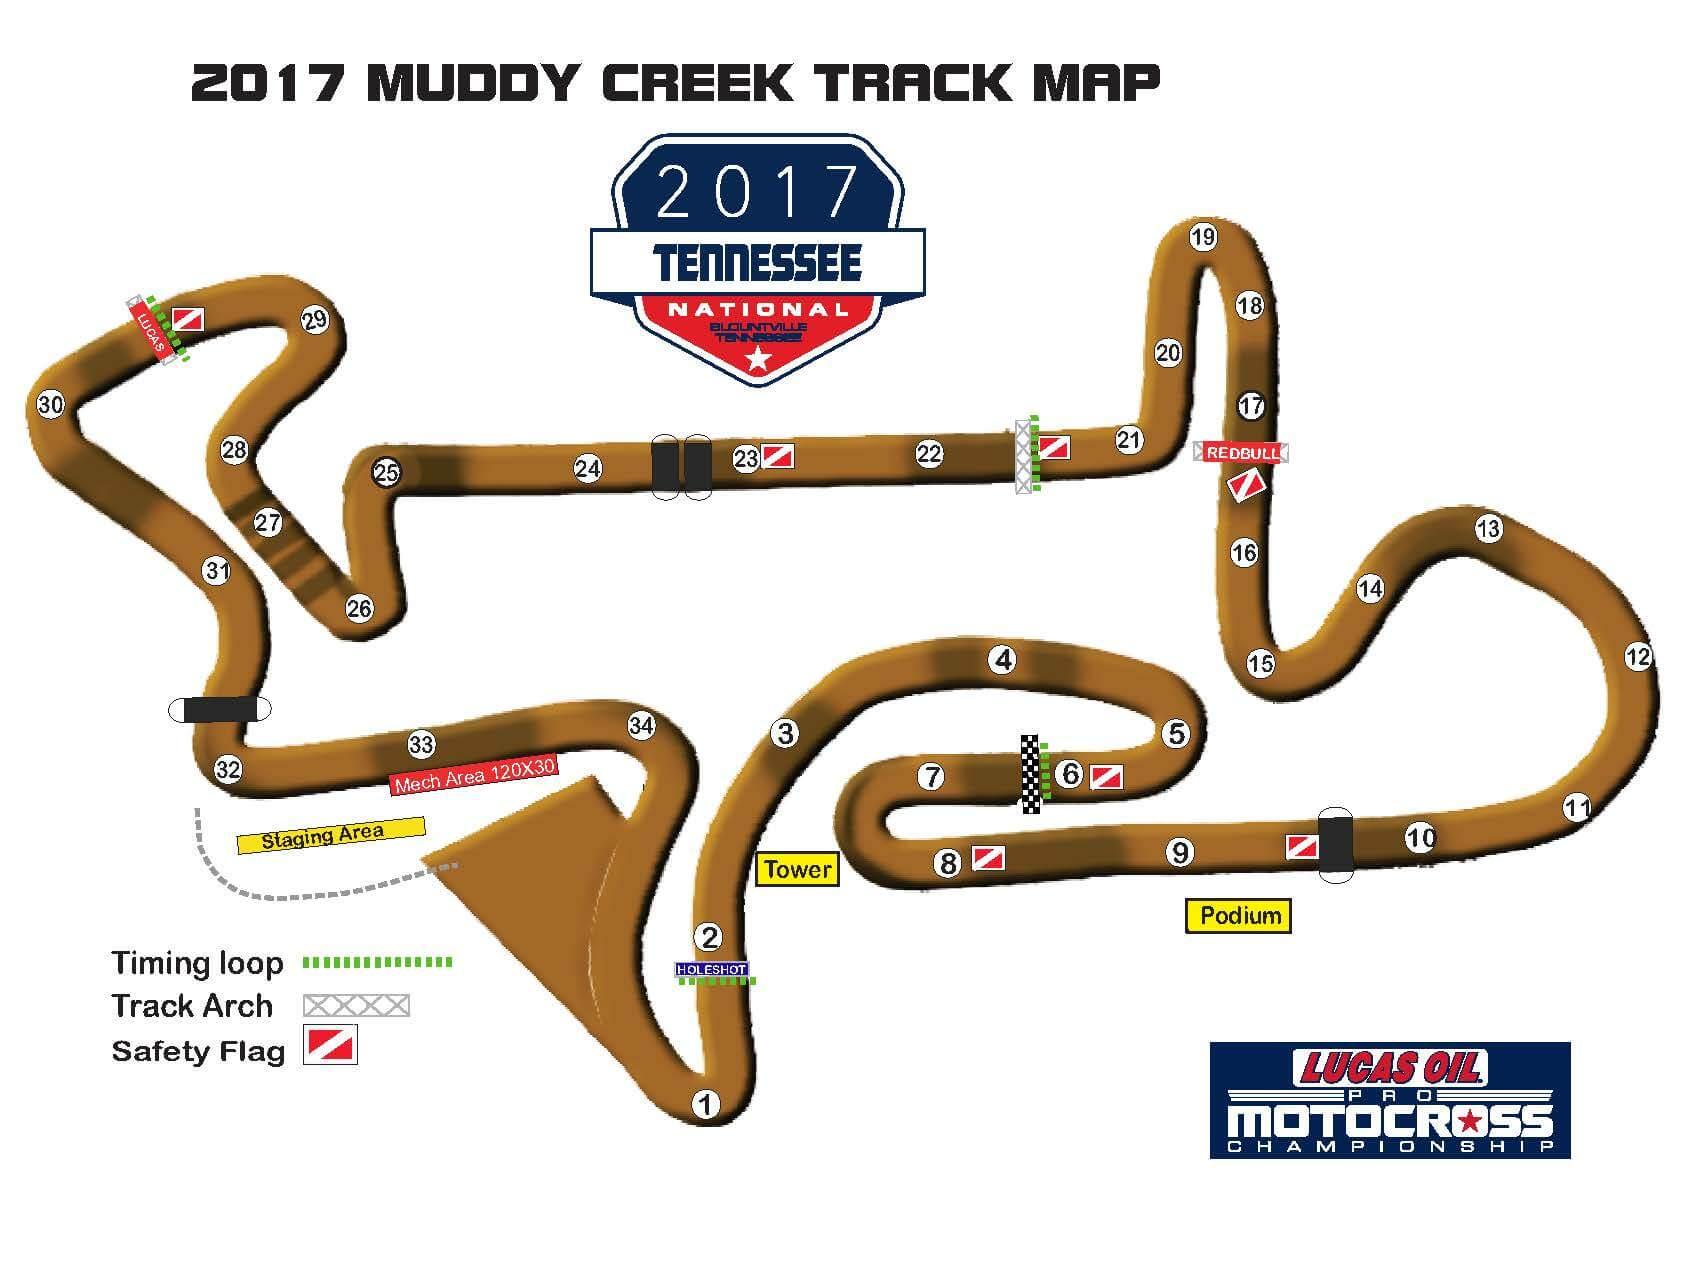 2017 Muddy Creek Track Map.jpg